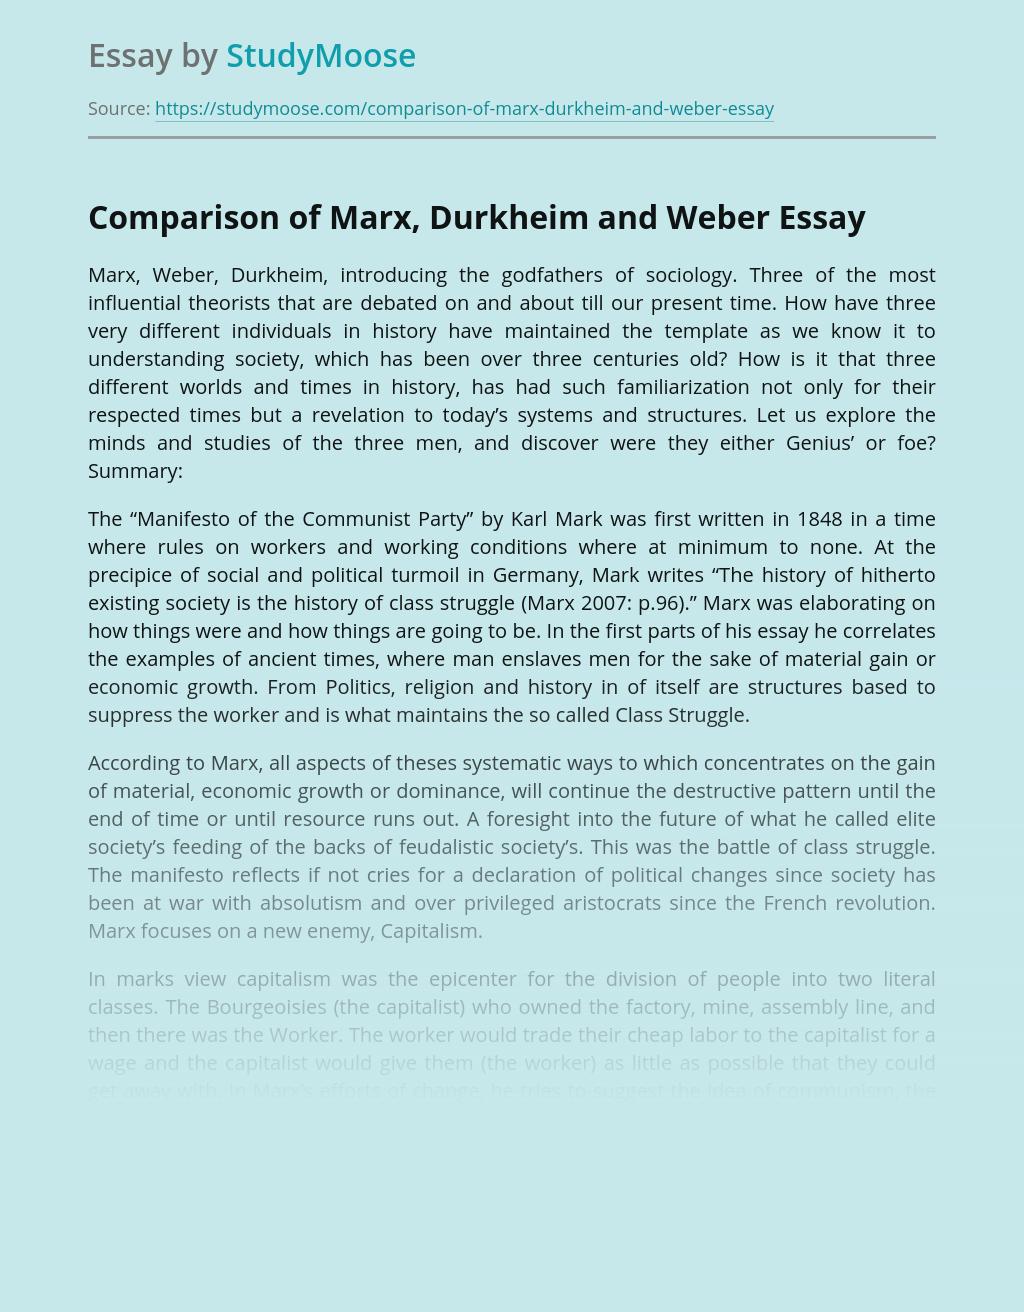 Comparison of Marx, Durkheim and Weber